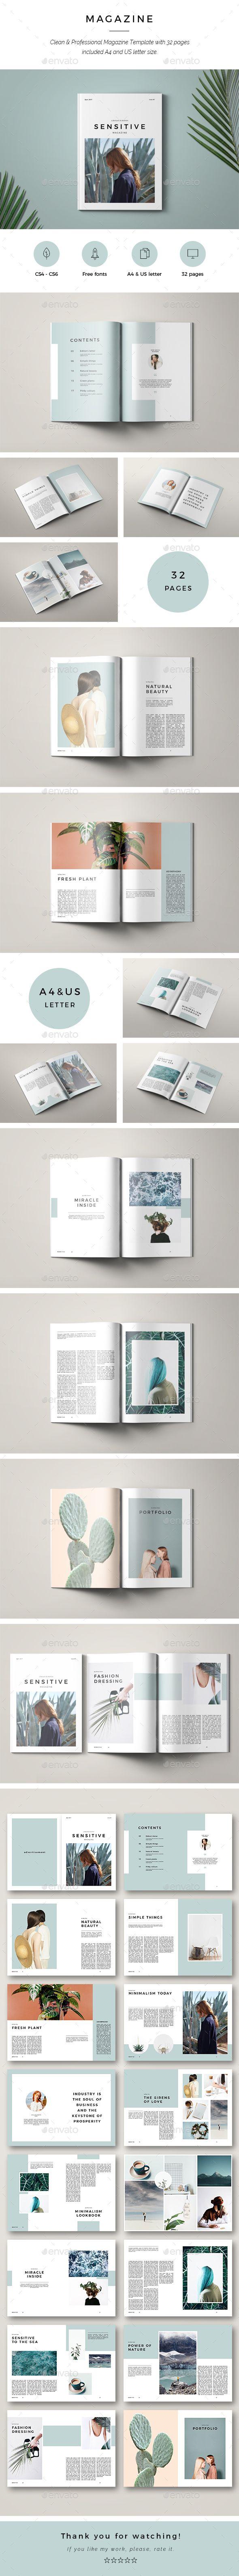 Sensitive Minimal Magazine — InDesign INDD #graphic design #marketing • Download ➝ https://graphicriver.net/item/sensitive-minimal-magazine/19762422?ref=pxcr